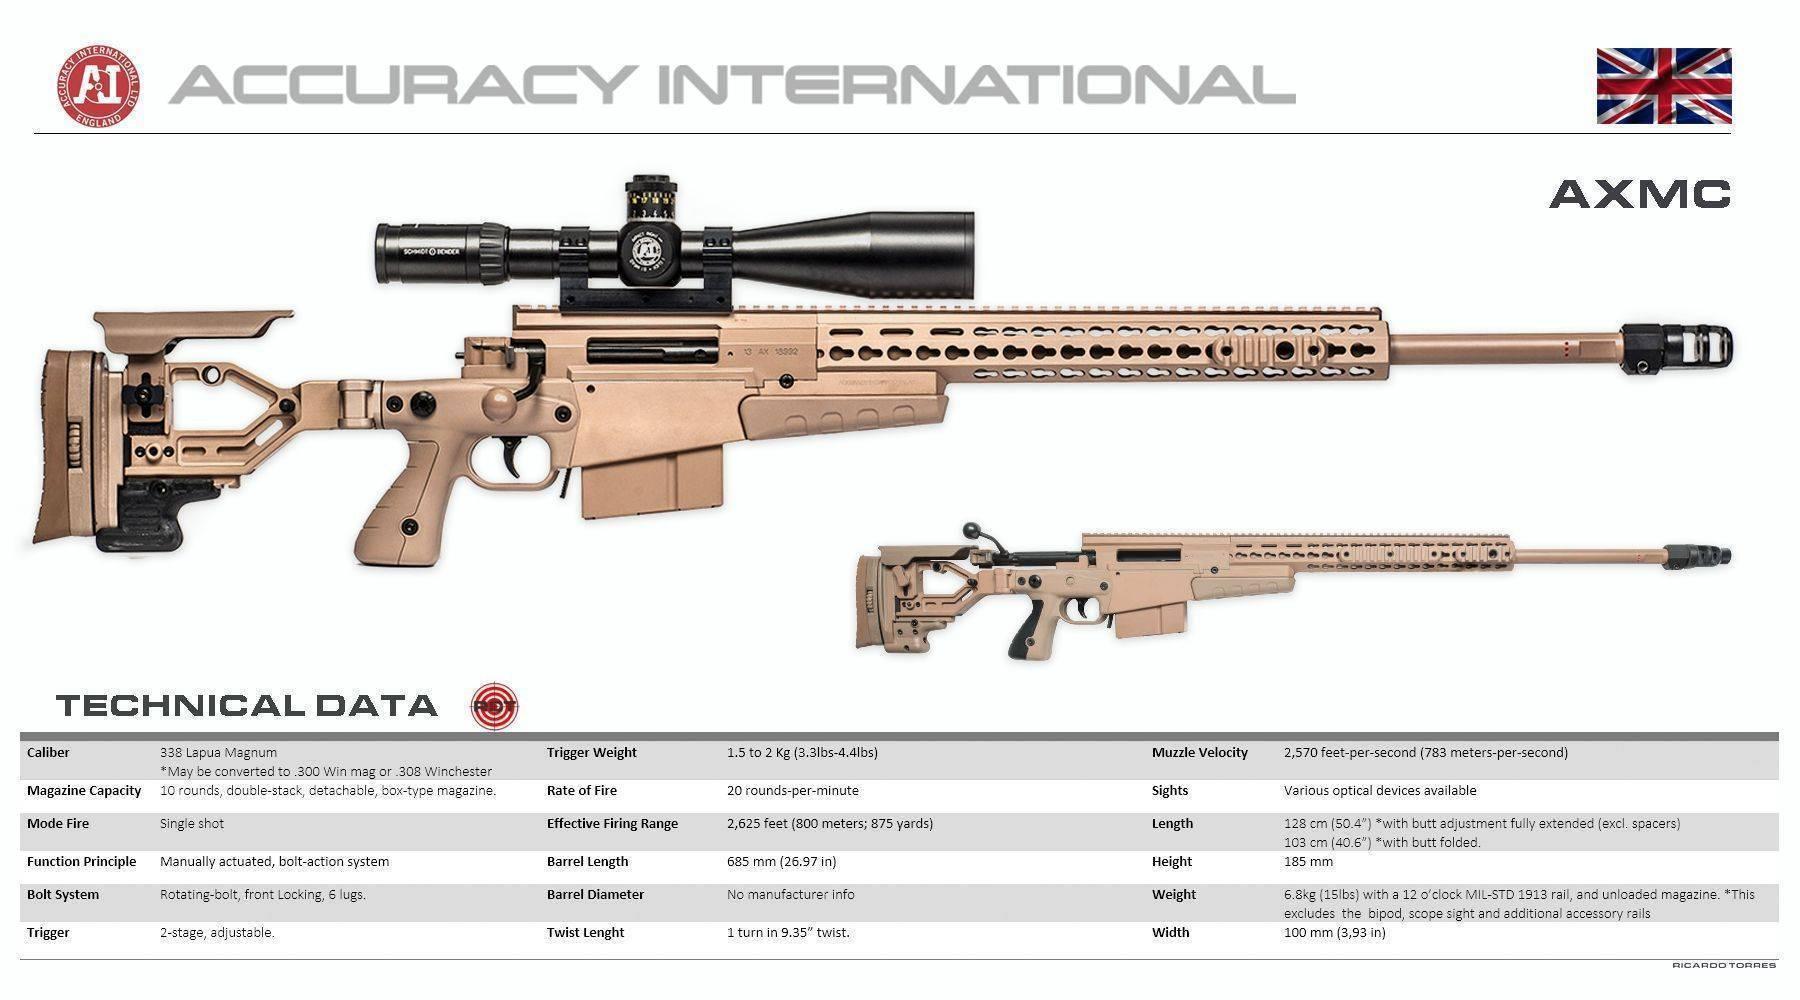 Accuracy international as50 снайперская винтовка — характеристики, фото, ттх